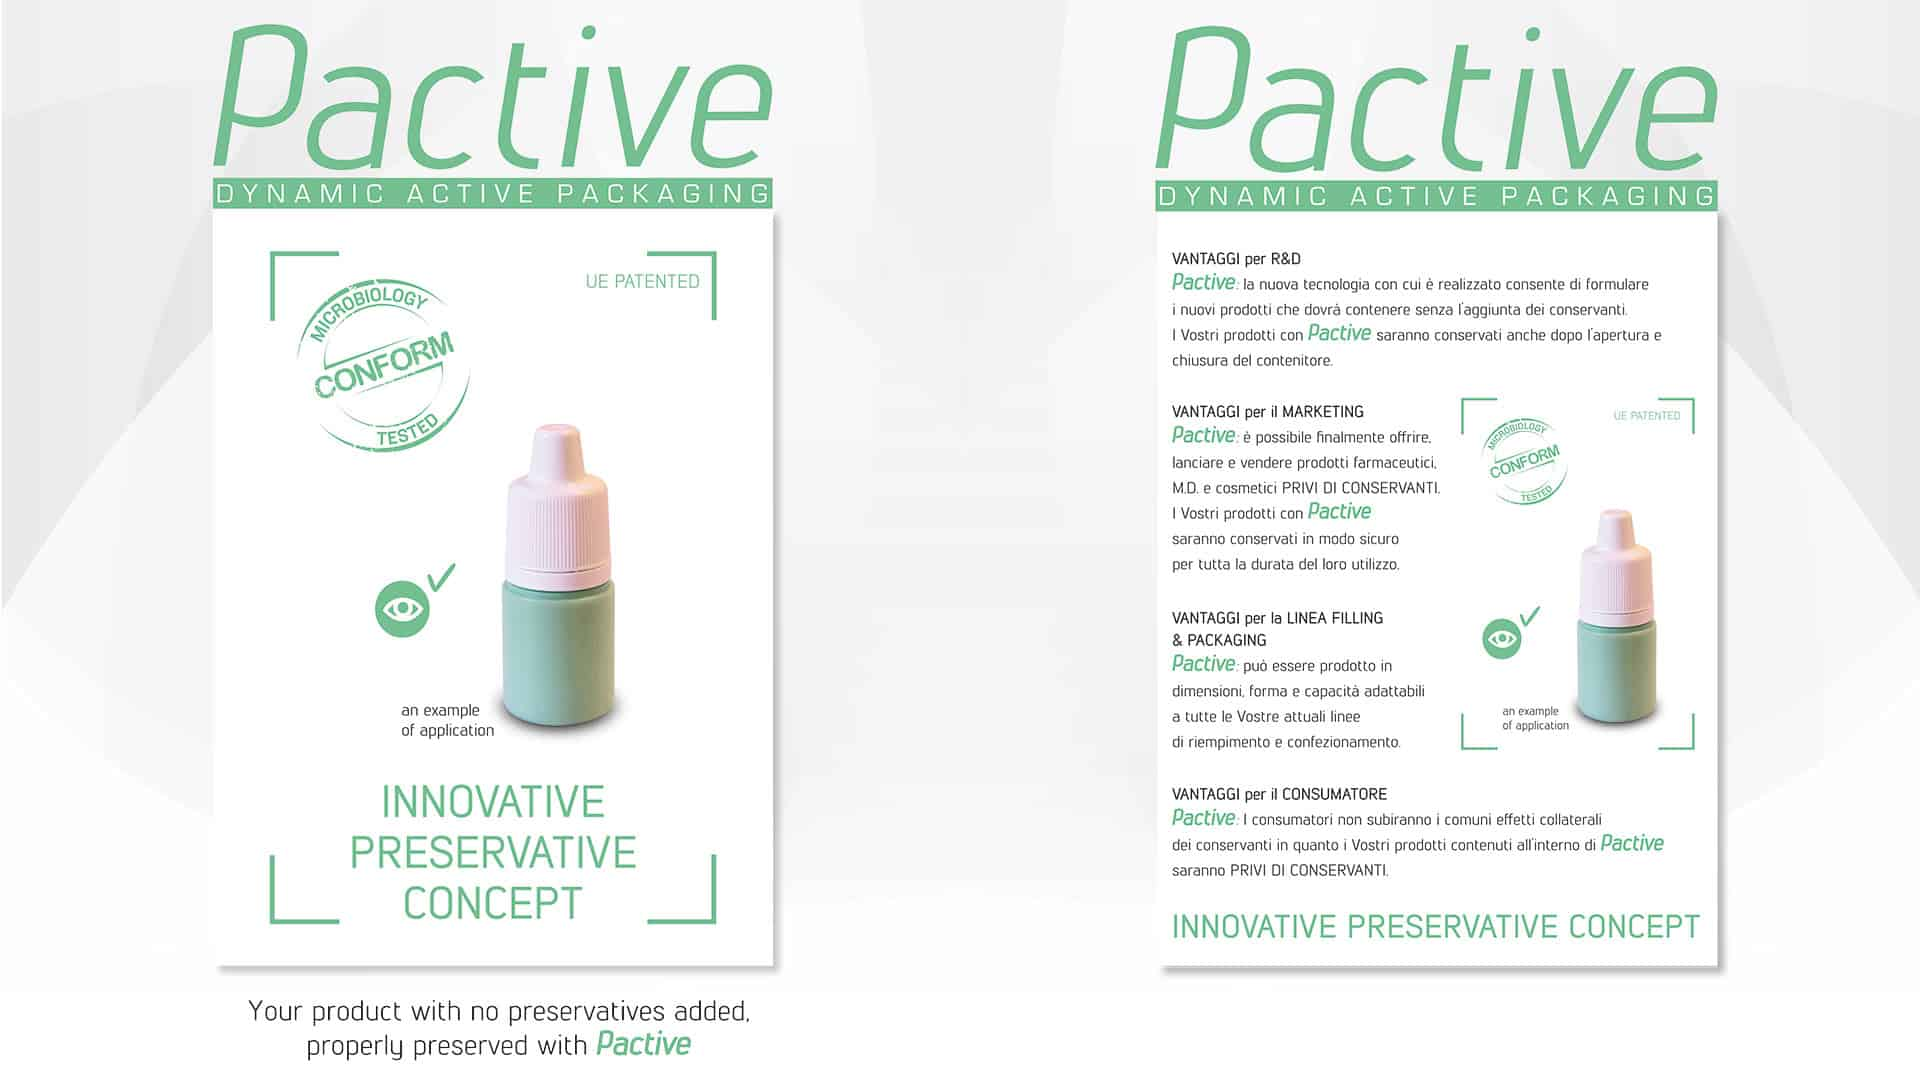 Innovative preservative concept di packaging primario.